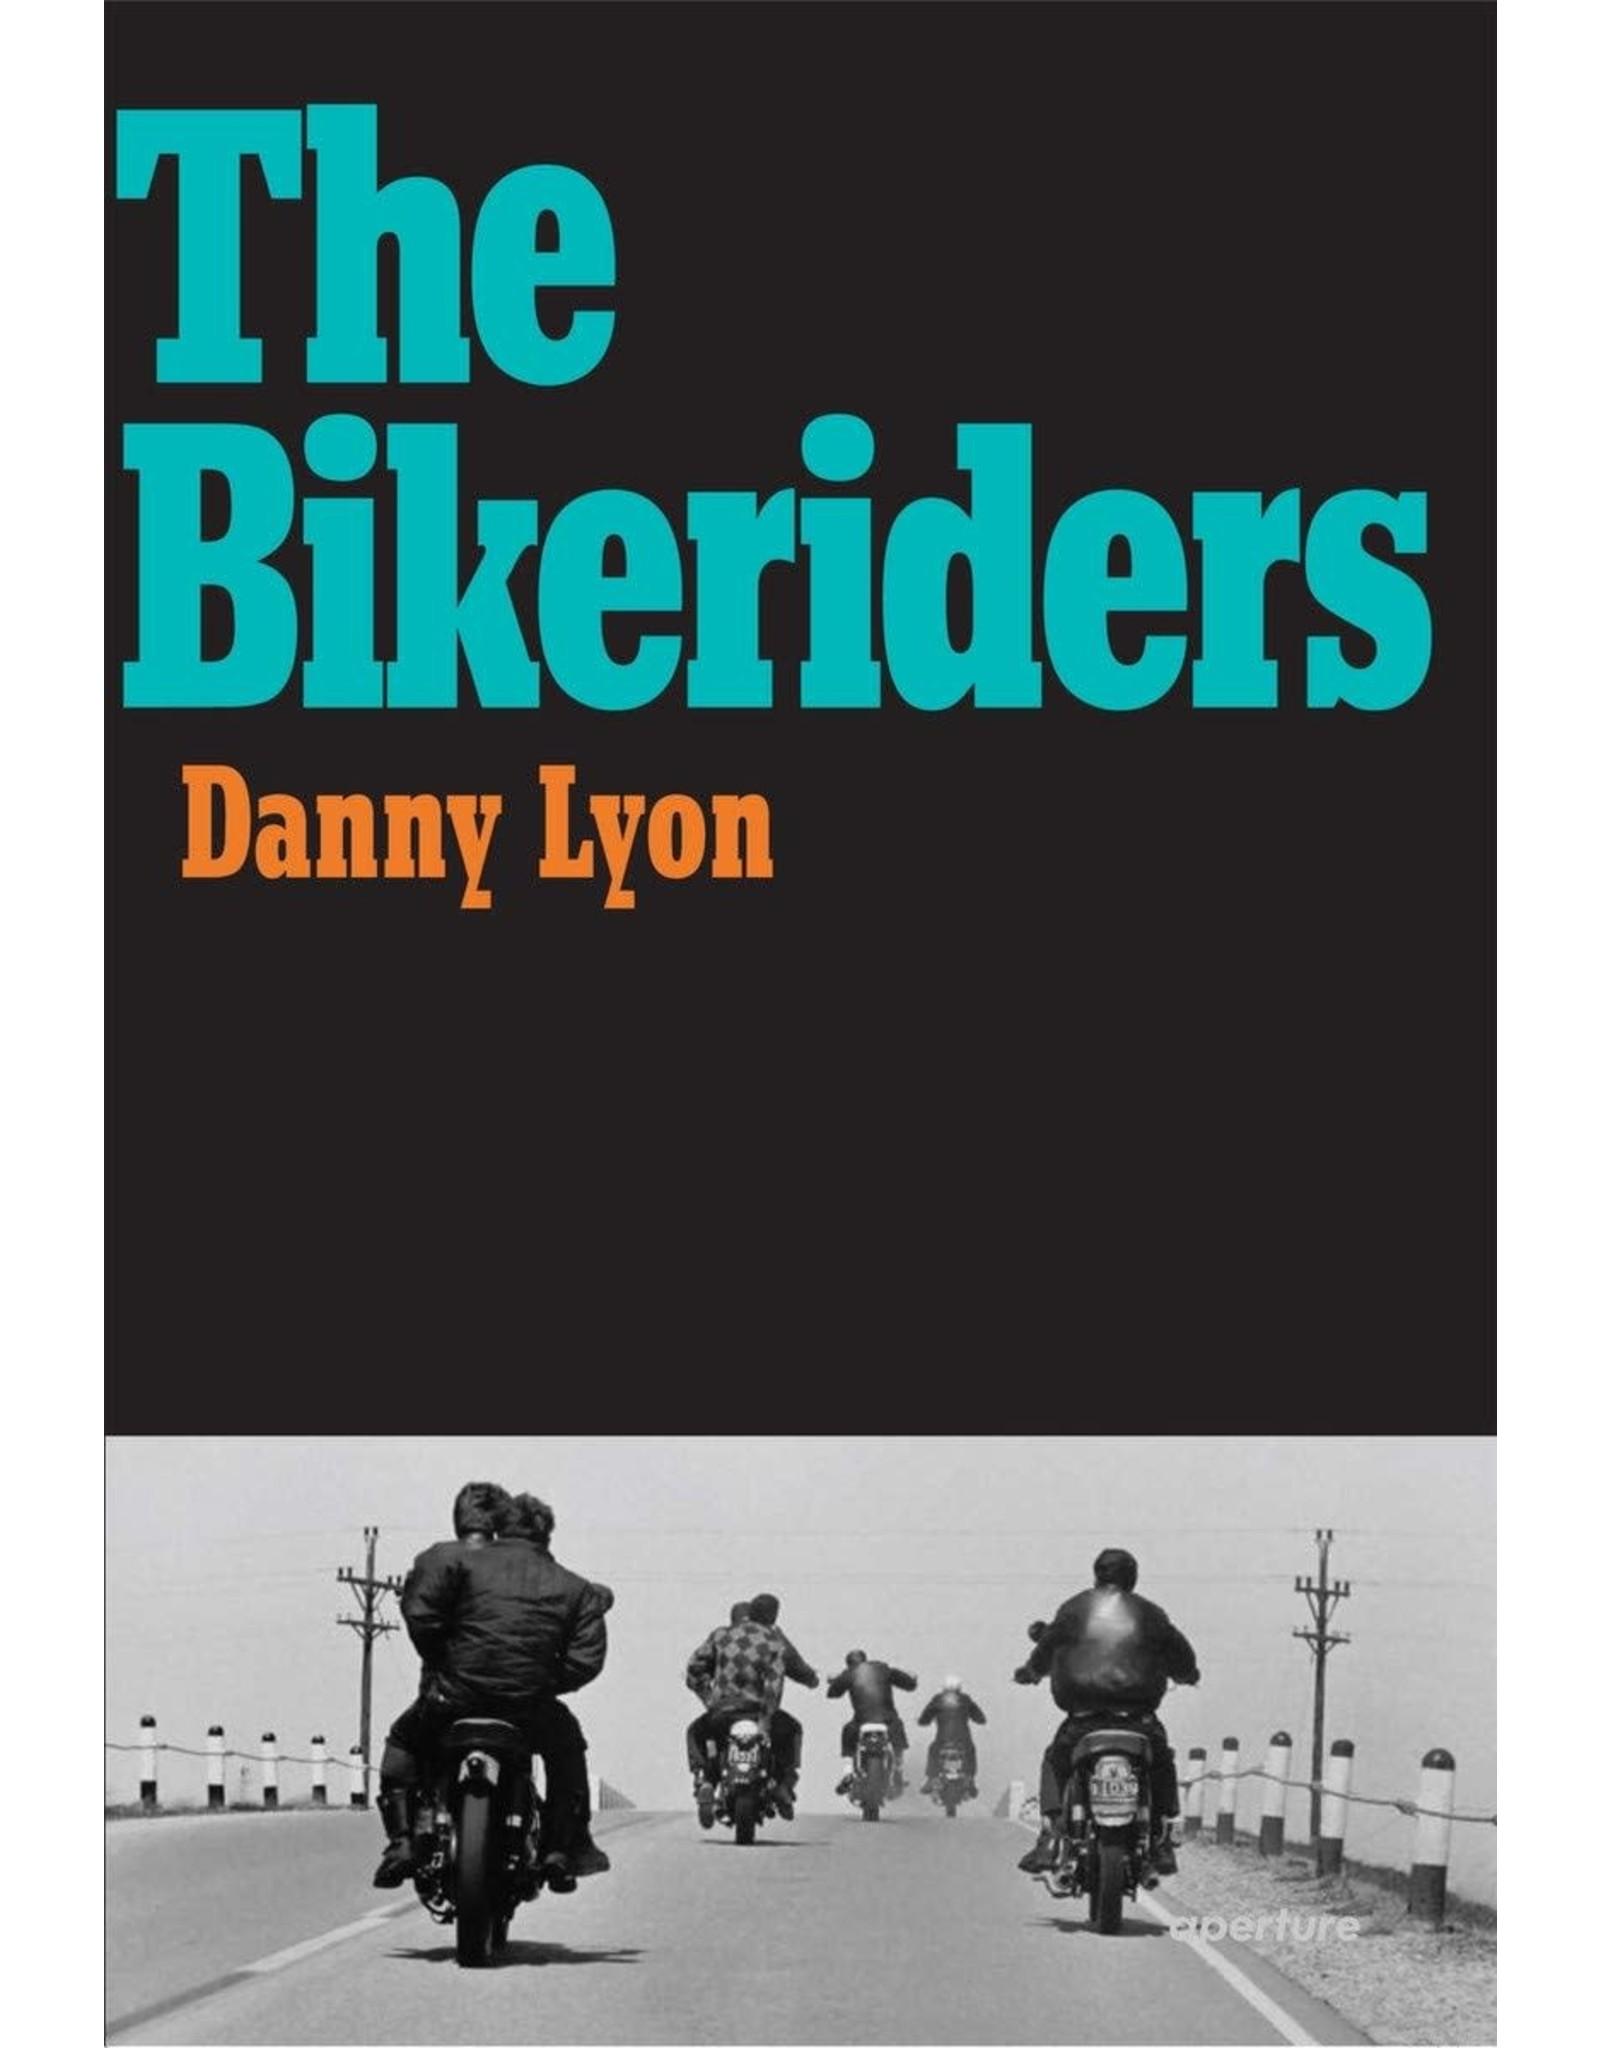 Danny Lyon: The Bikeriders HC